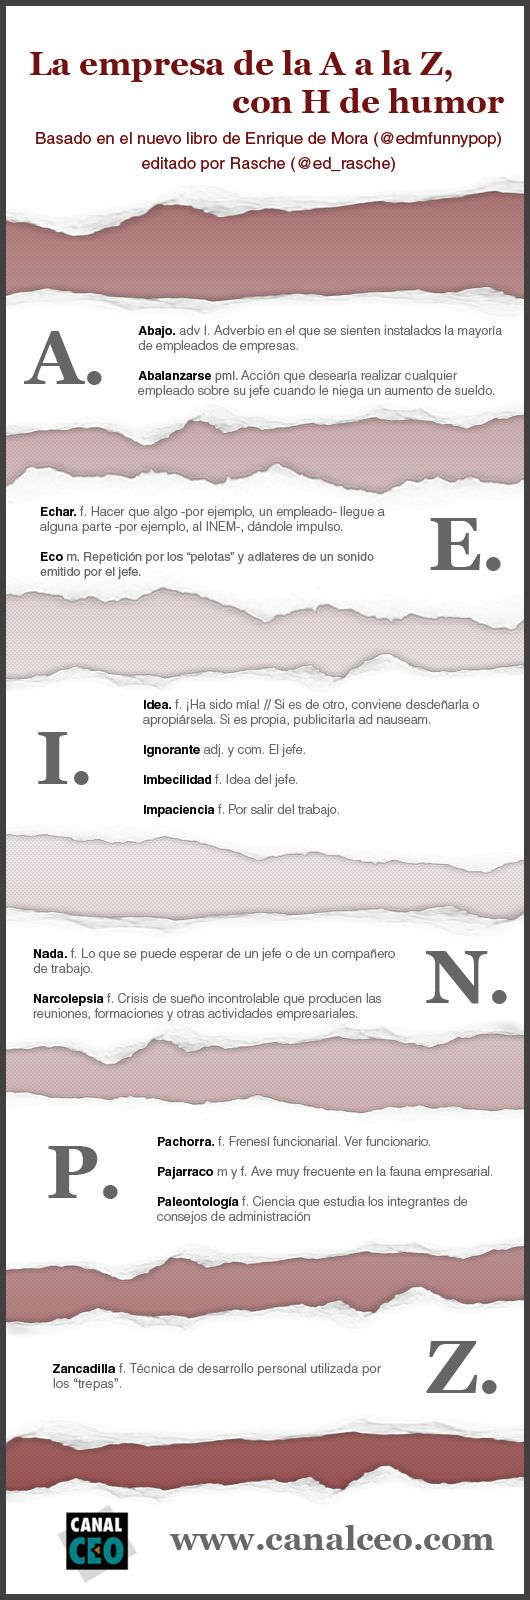 La empresa de la A a la Z (con humor) #infografia